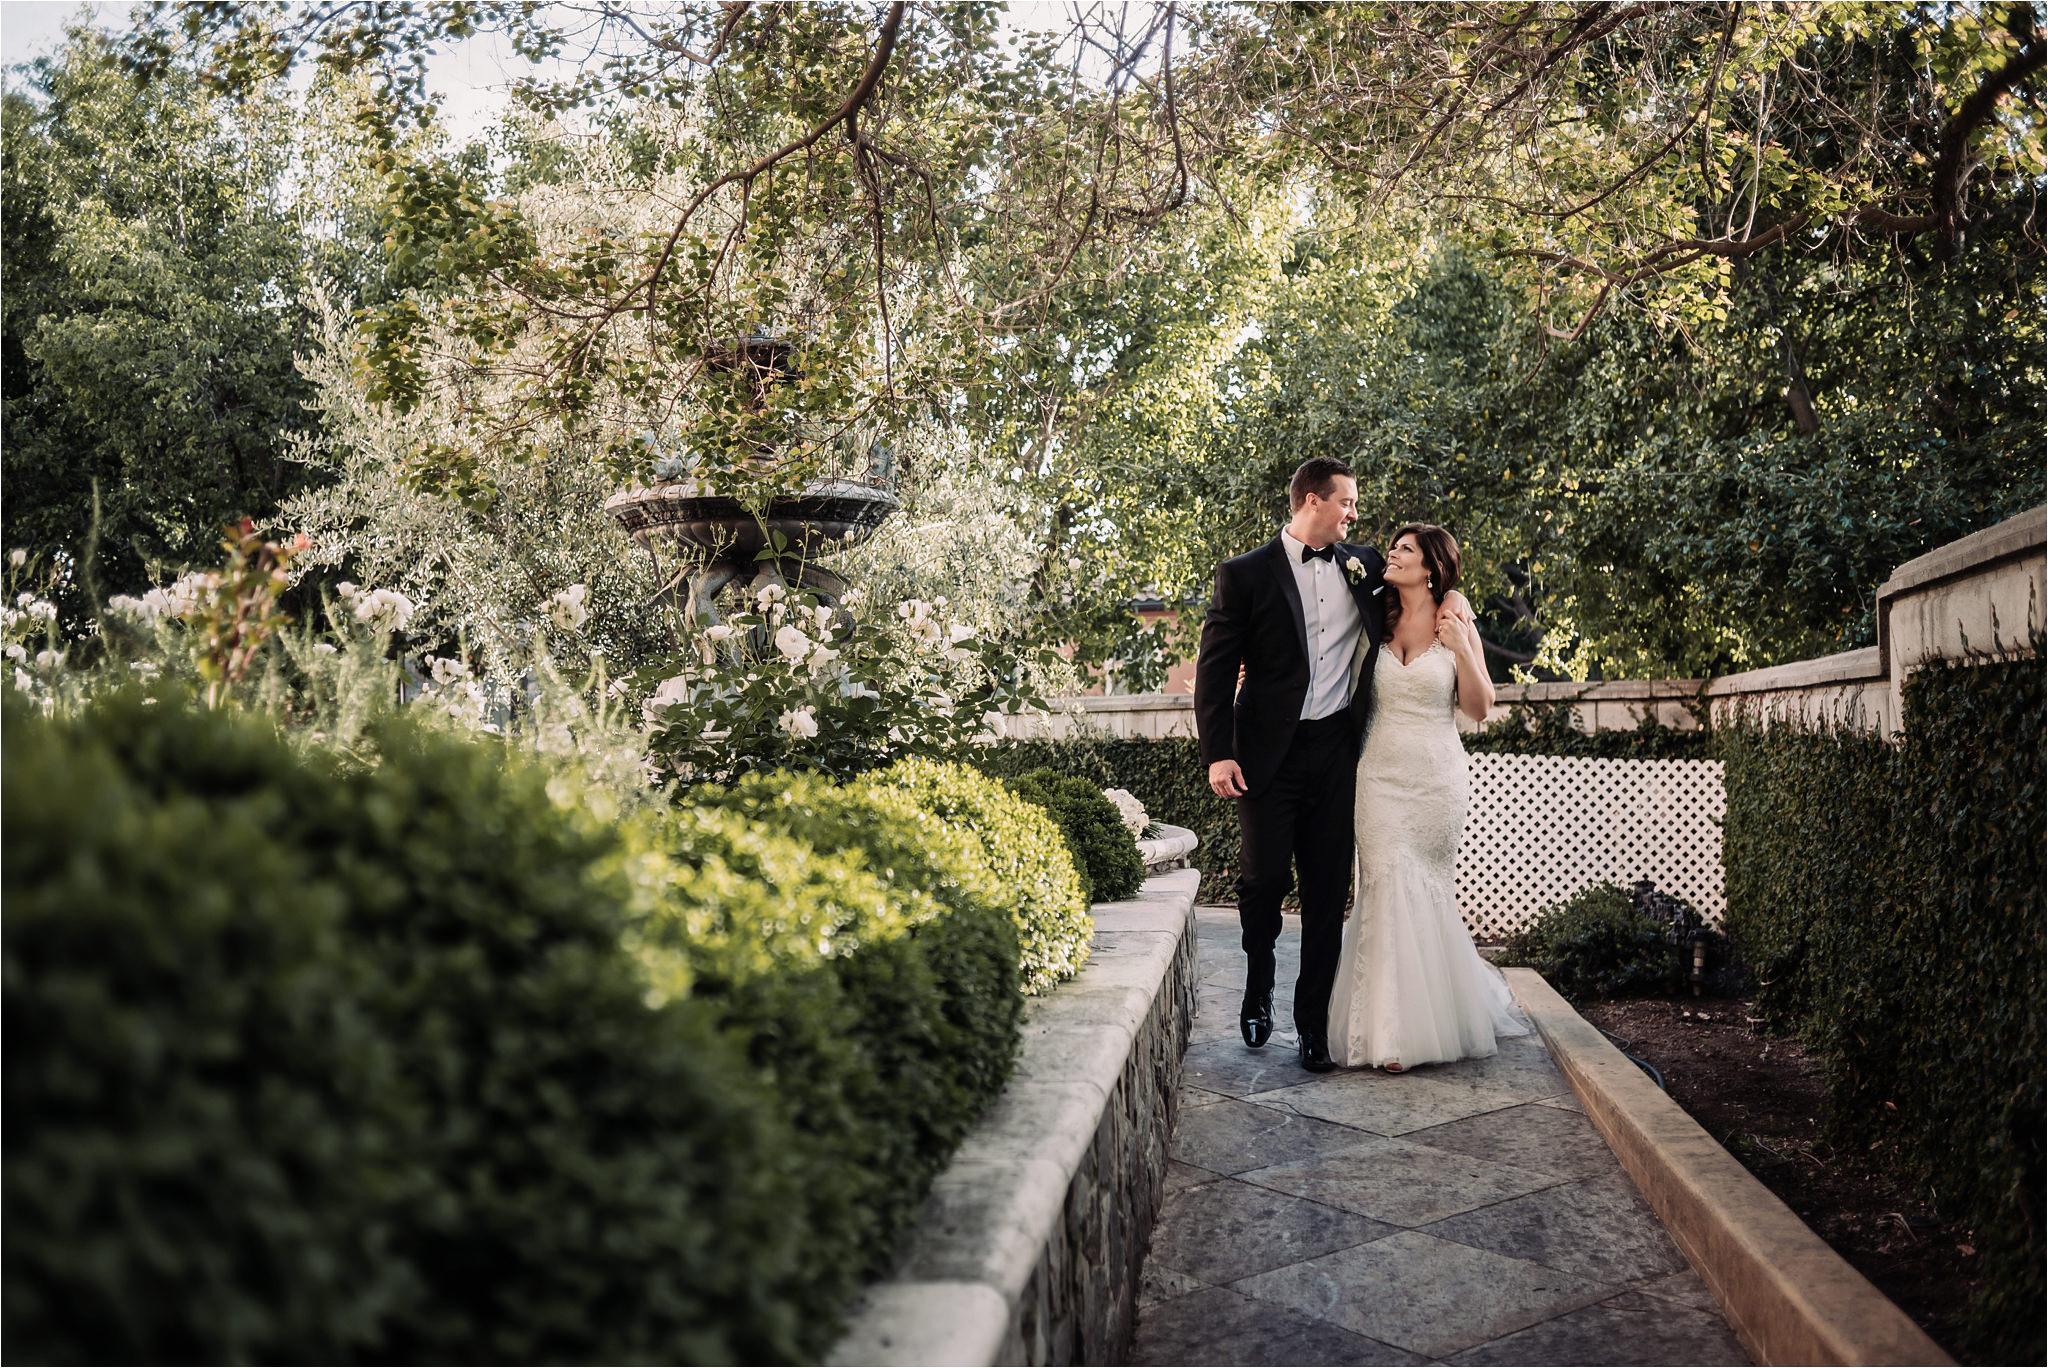 jessica-roman-photography-arden hills wedding photograpger-sacramento-boise-38.jpg